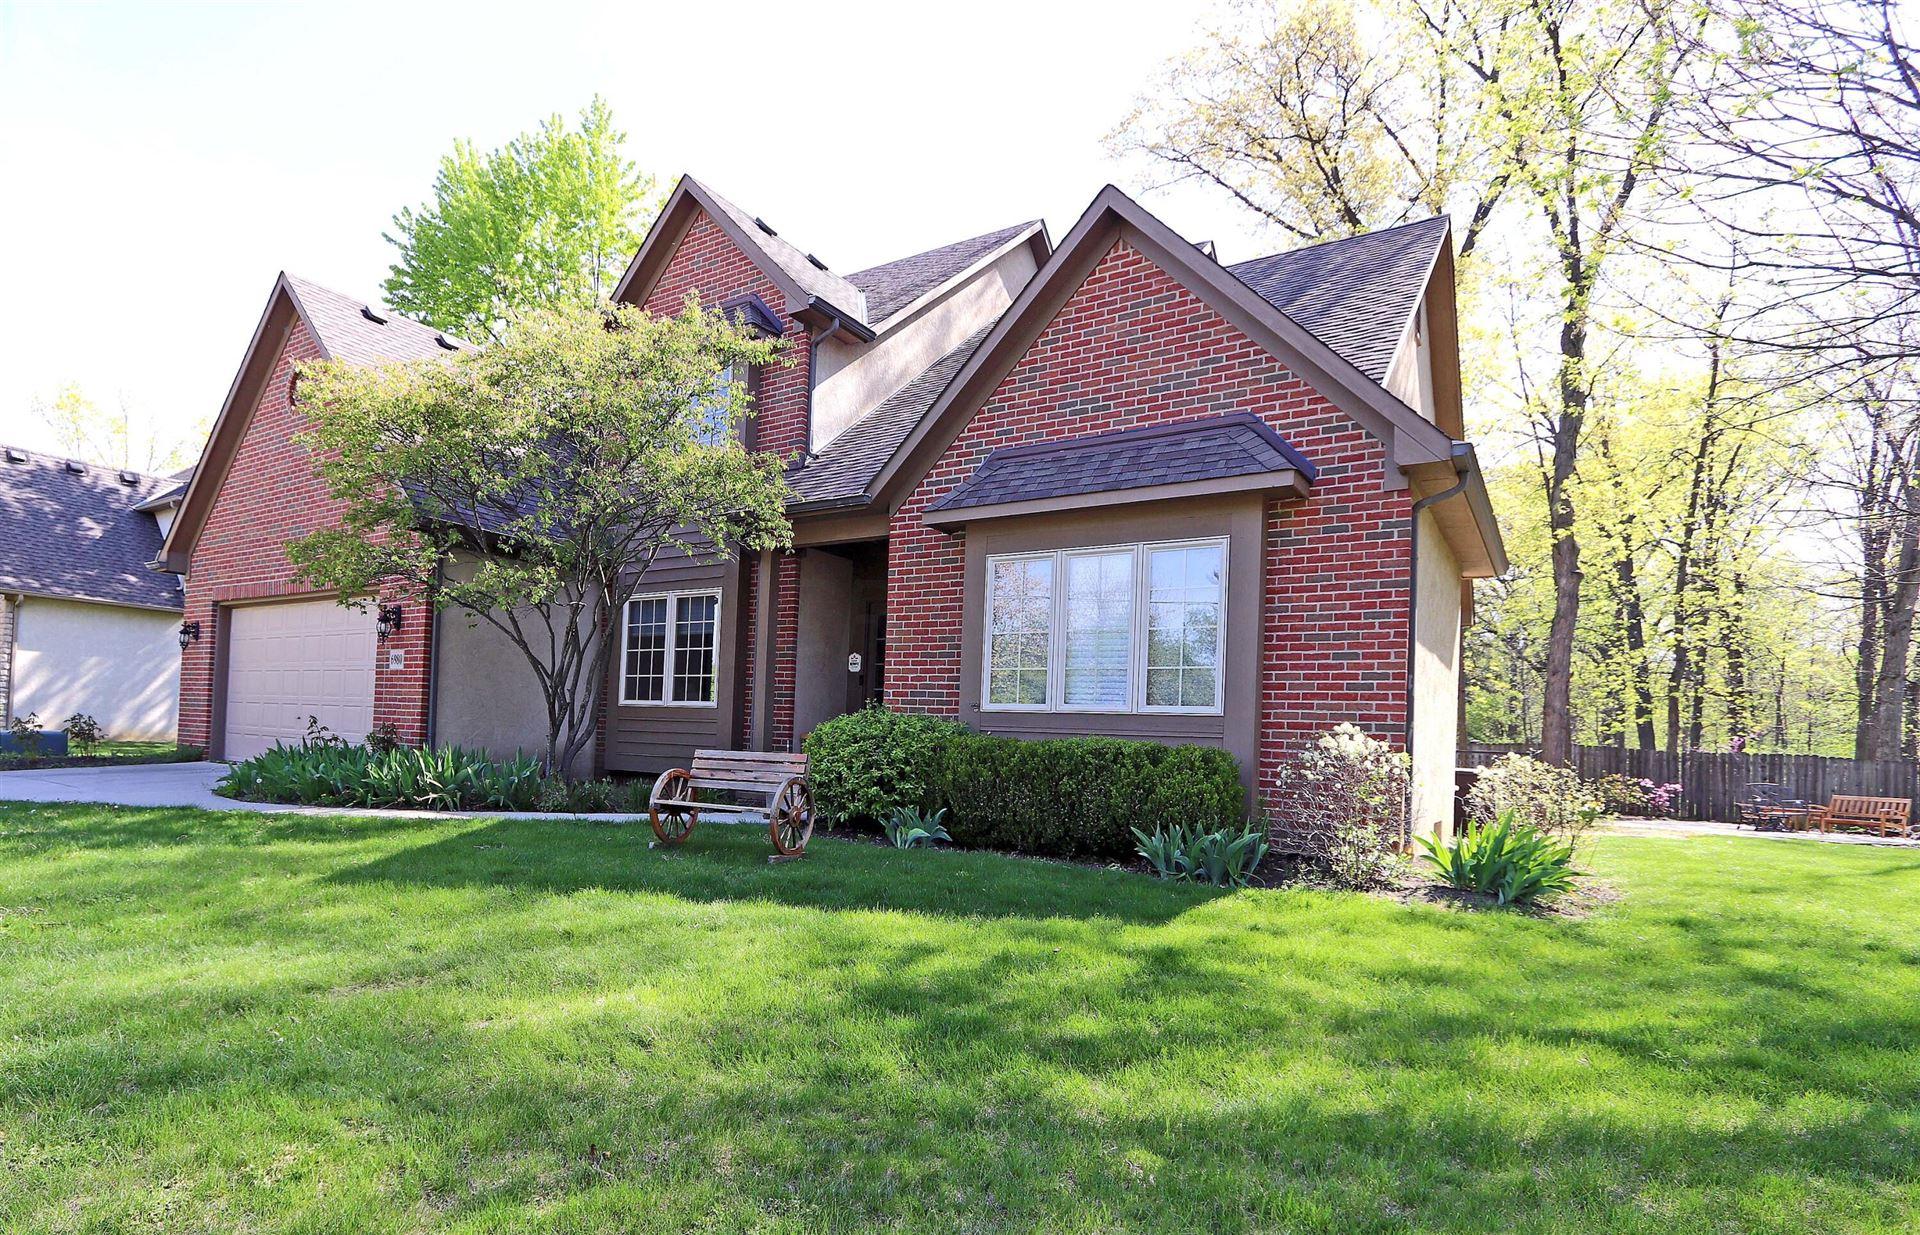 Photo of 6980 Westview Drive, Worthington, OH 43085 (MLS # 221013217)